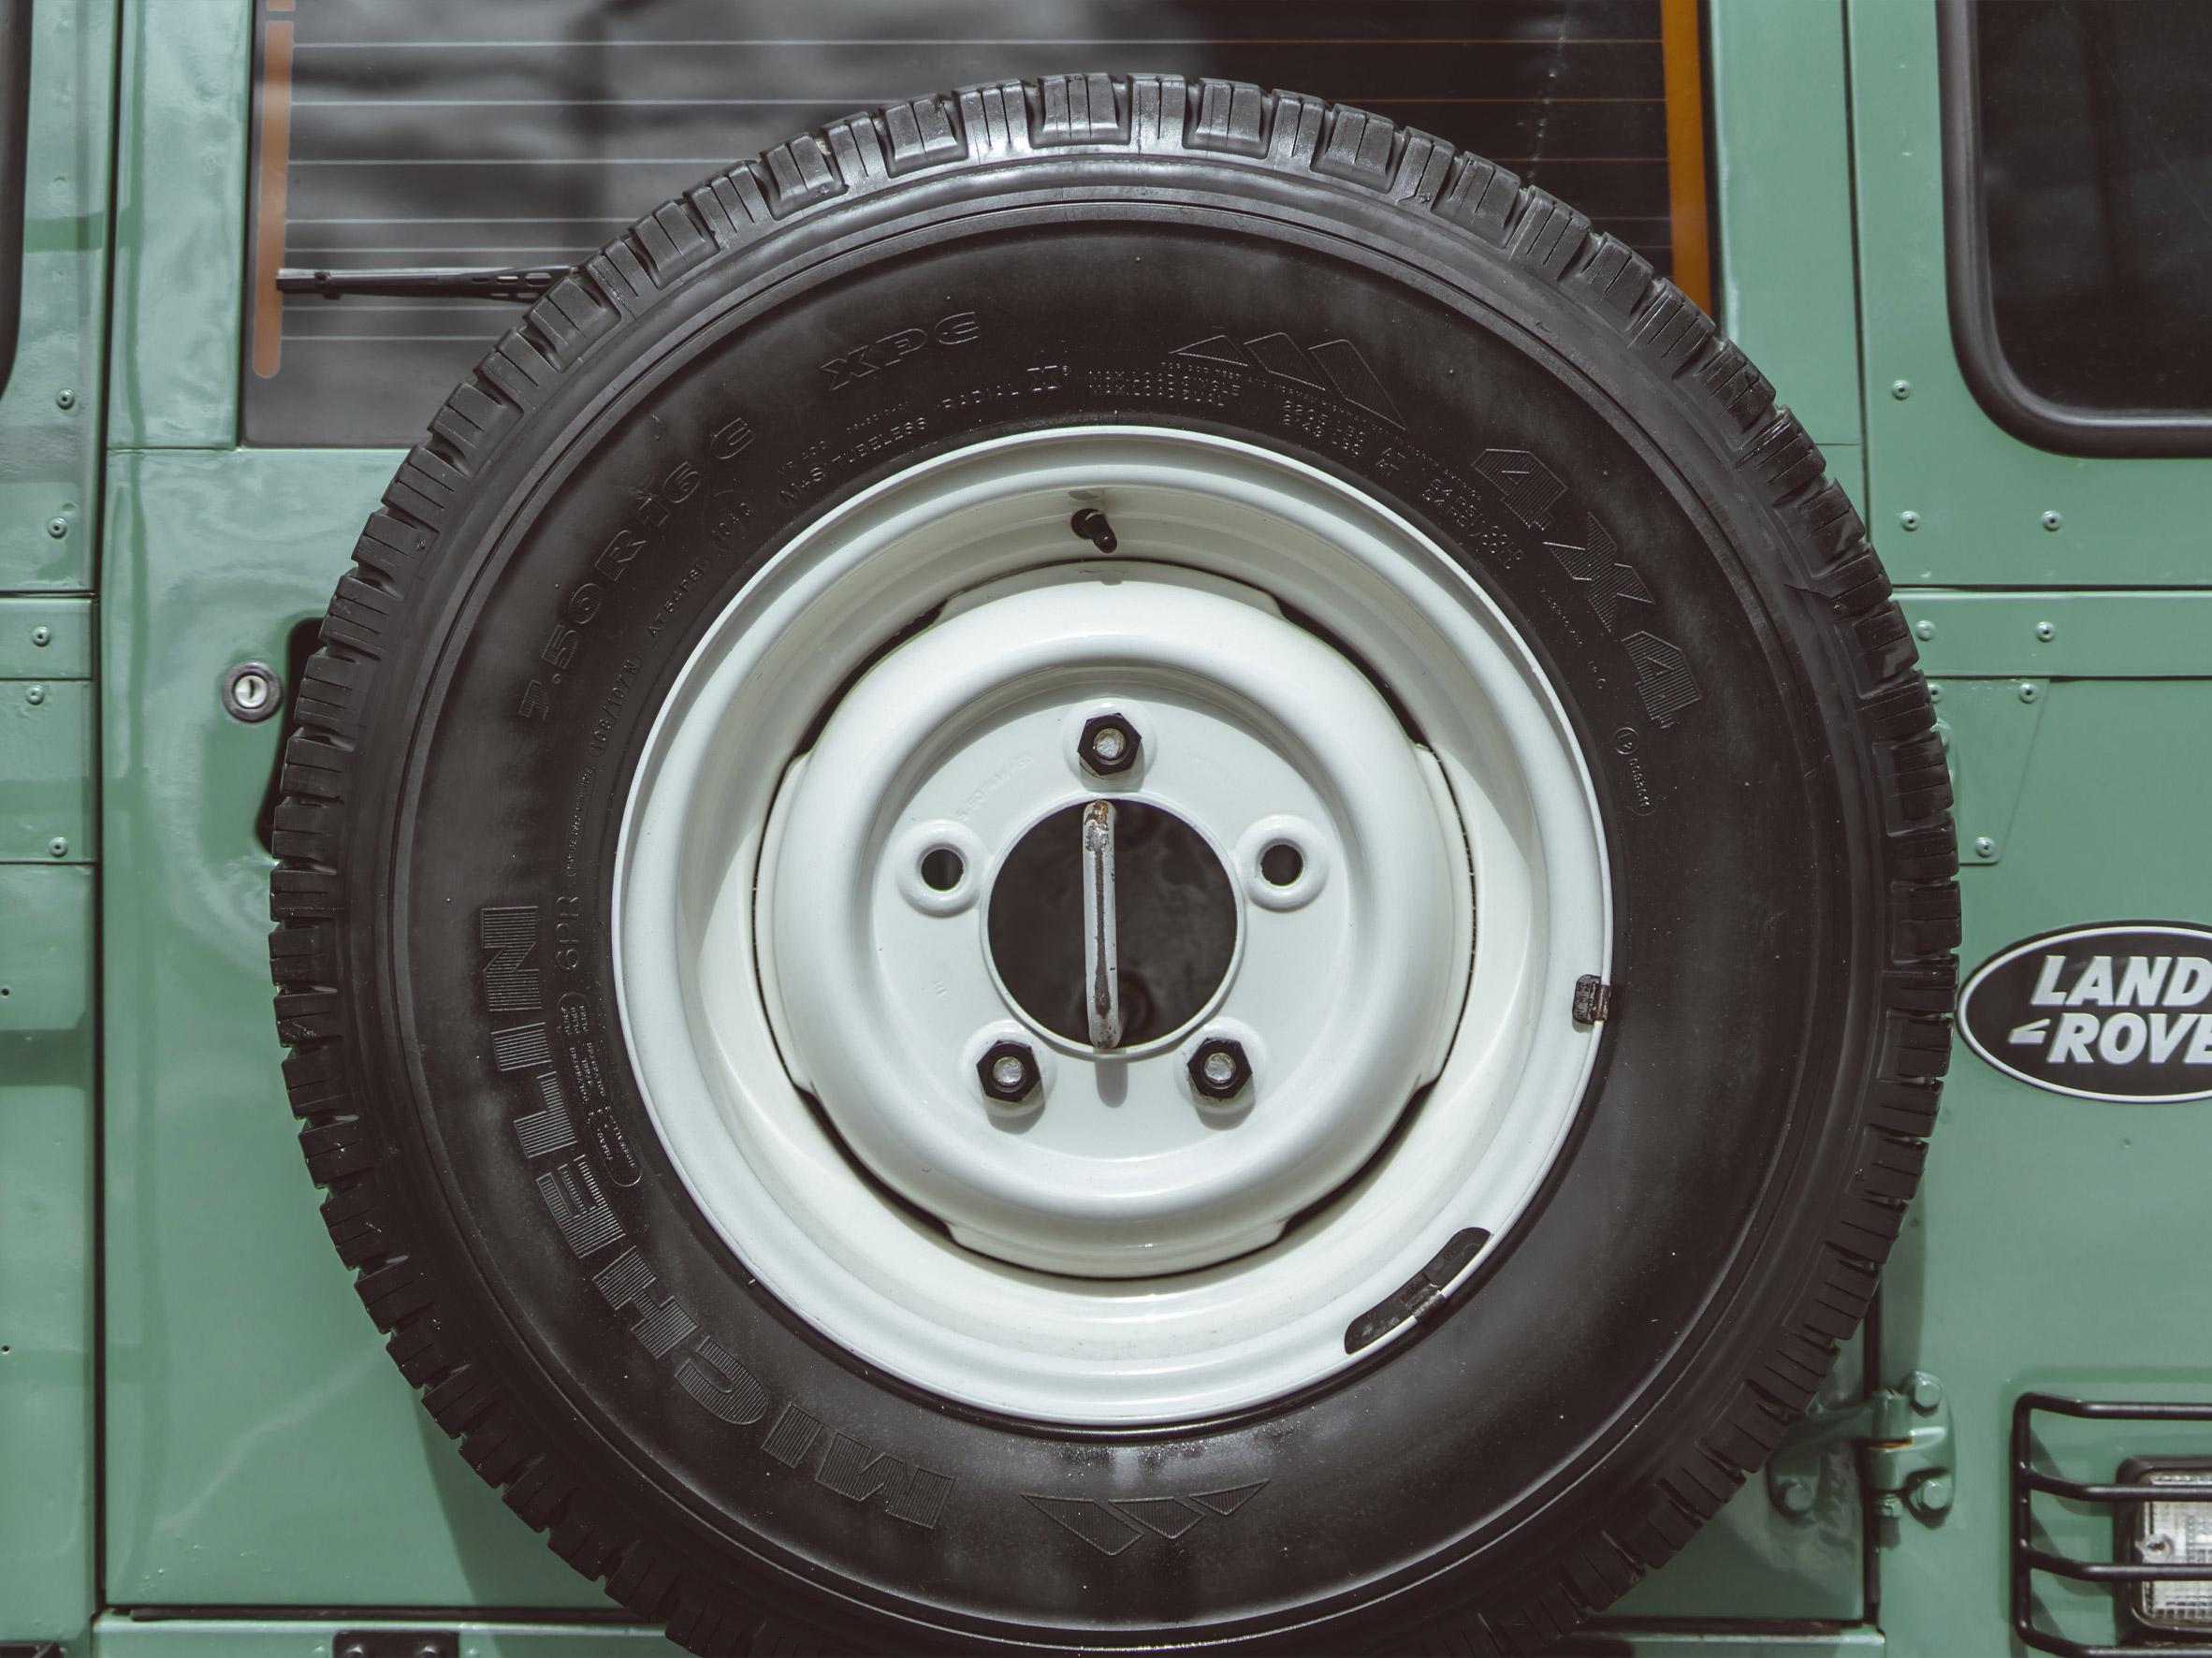 medium_Land_Rover_steel_wheels_01.jpg